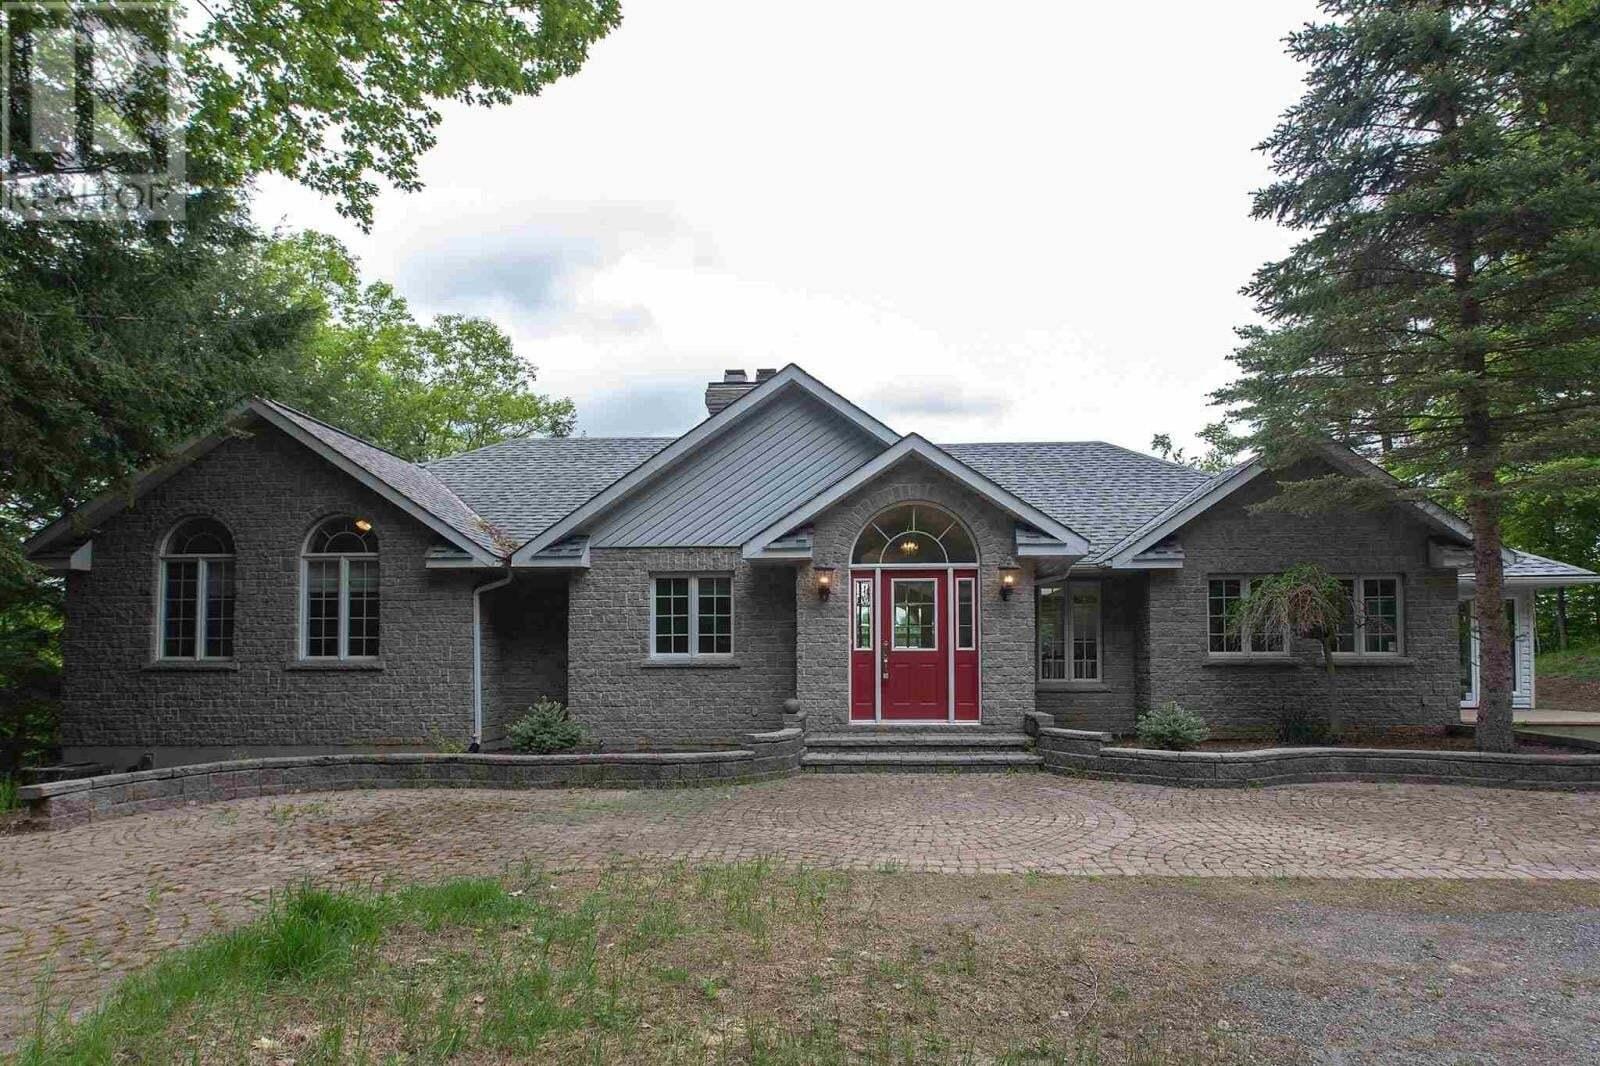 House for sale at 1633 Davis Lock Rd Elgin Ontario - MLS: K20002781